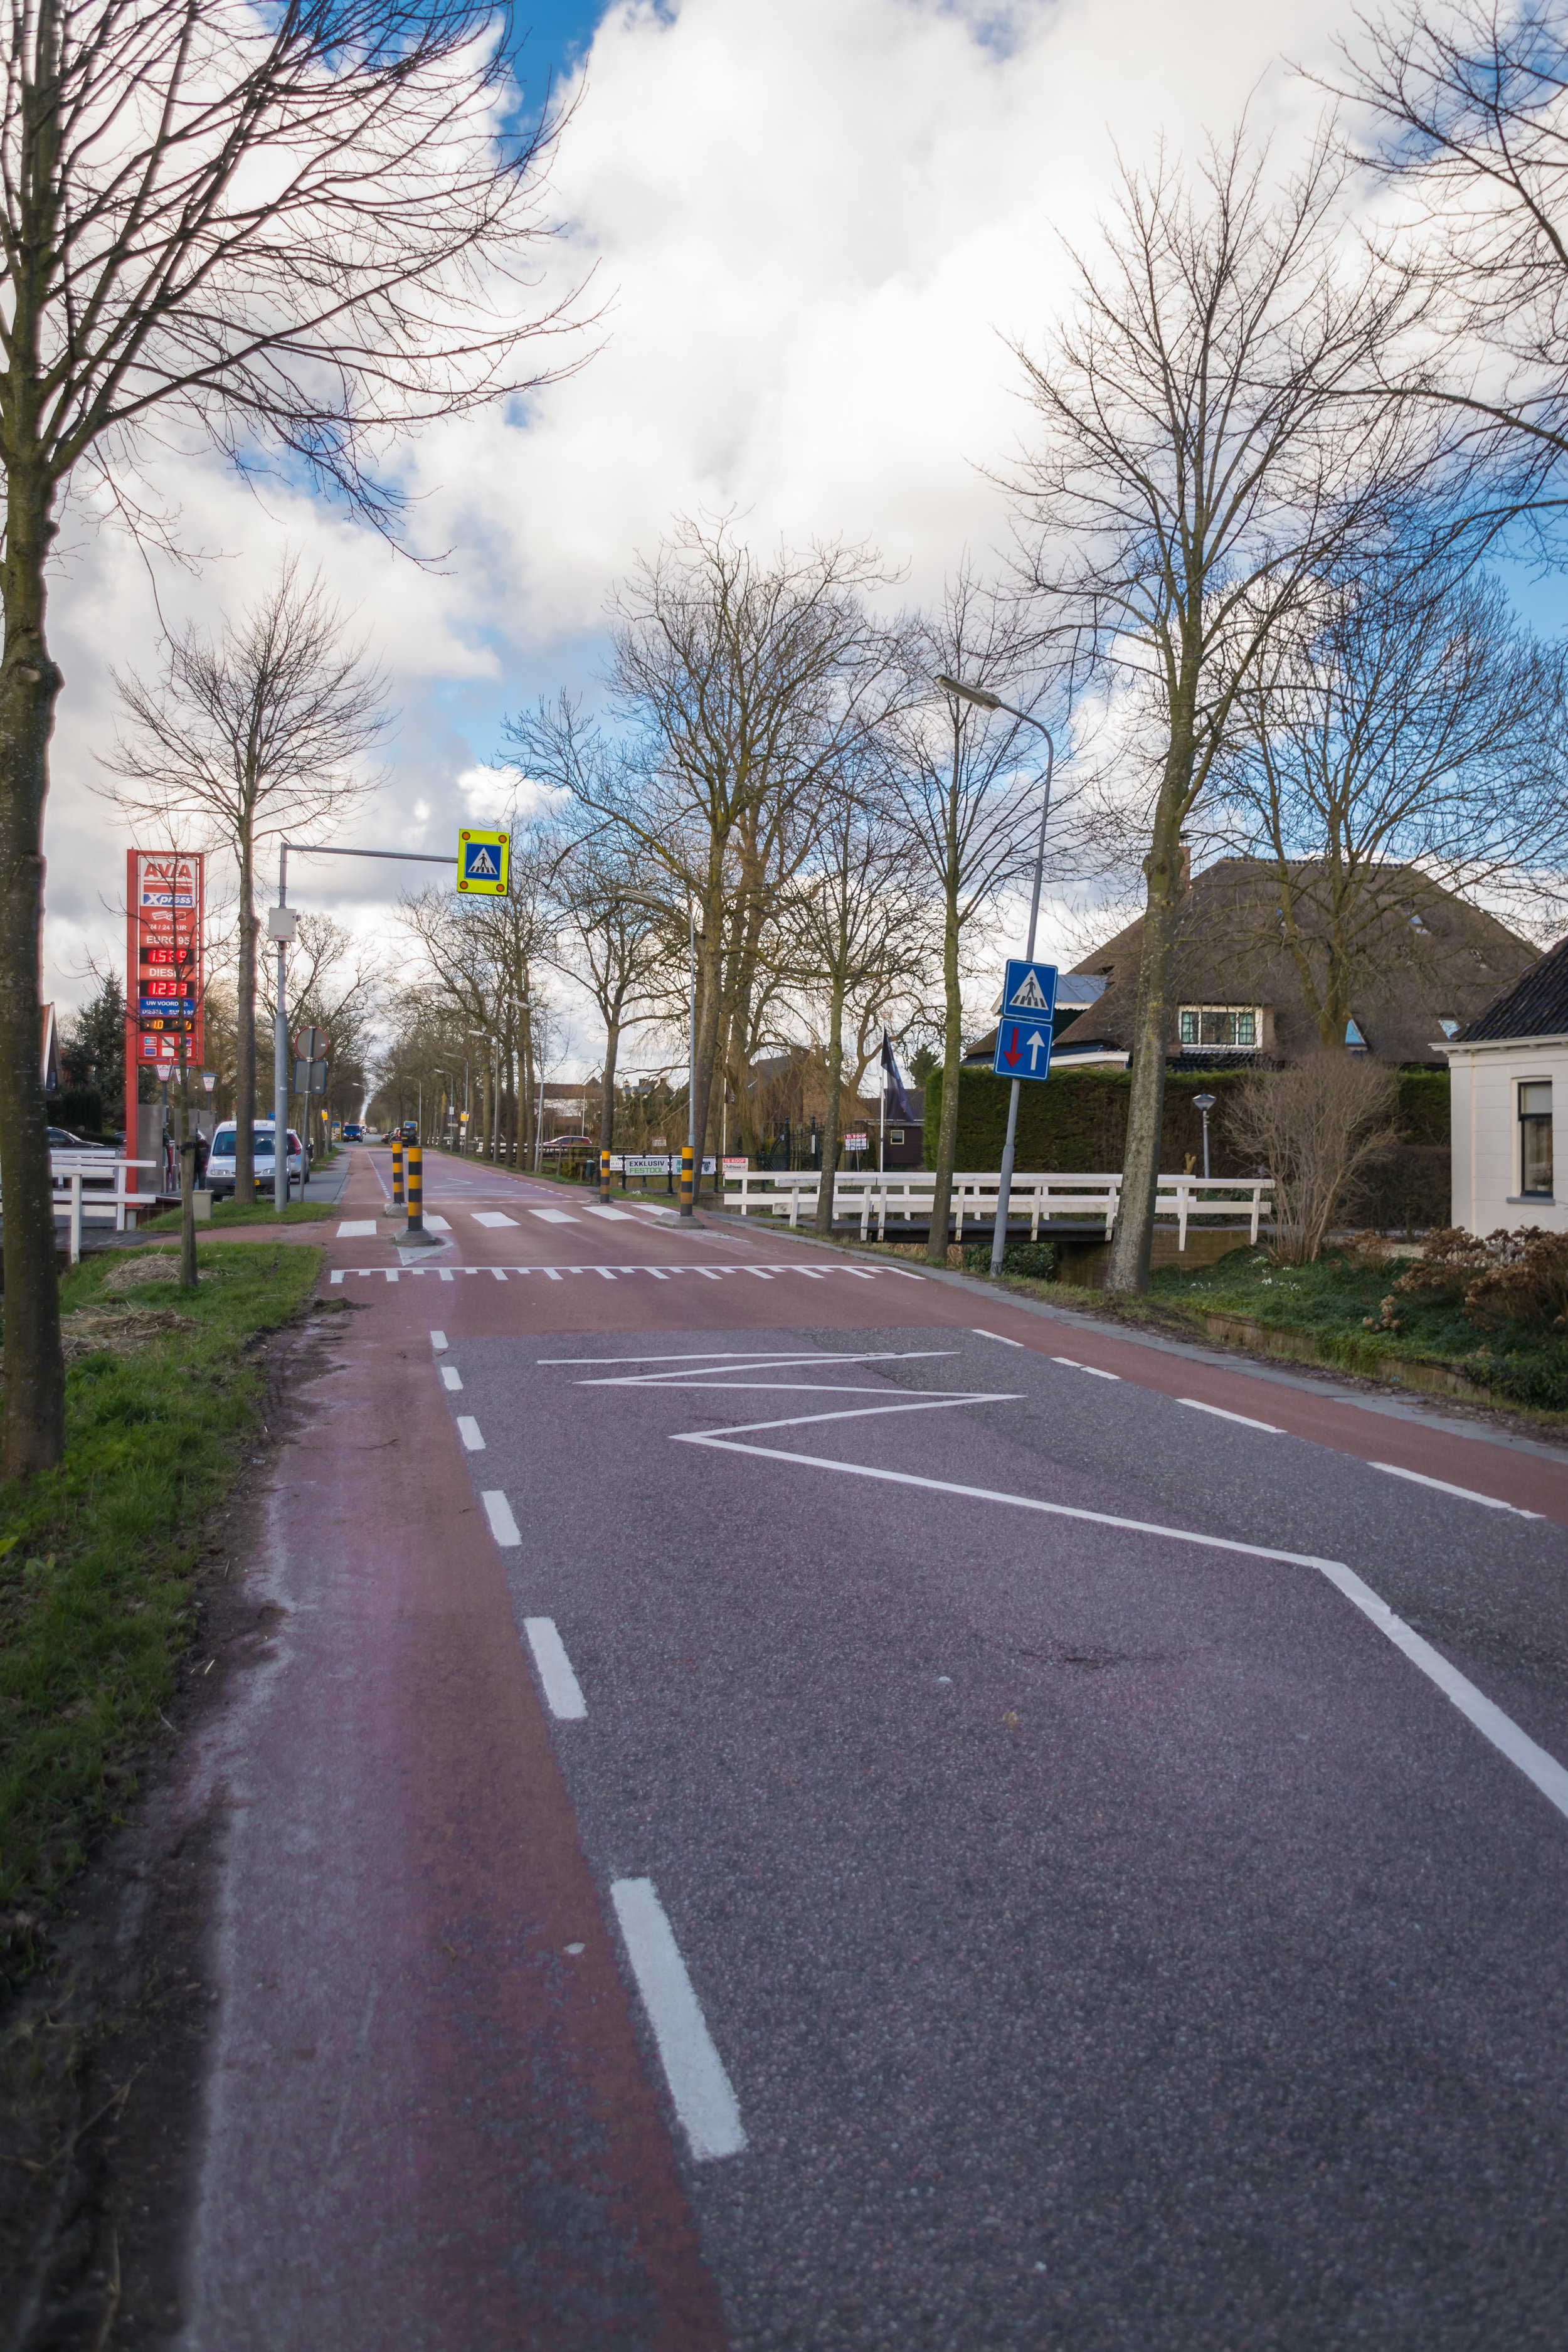 traffic-calming techniques